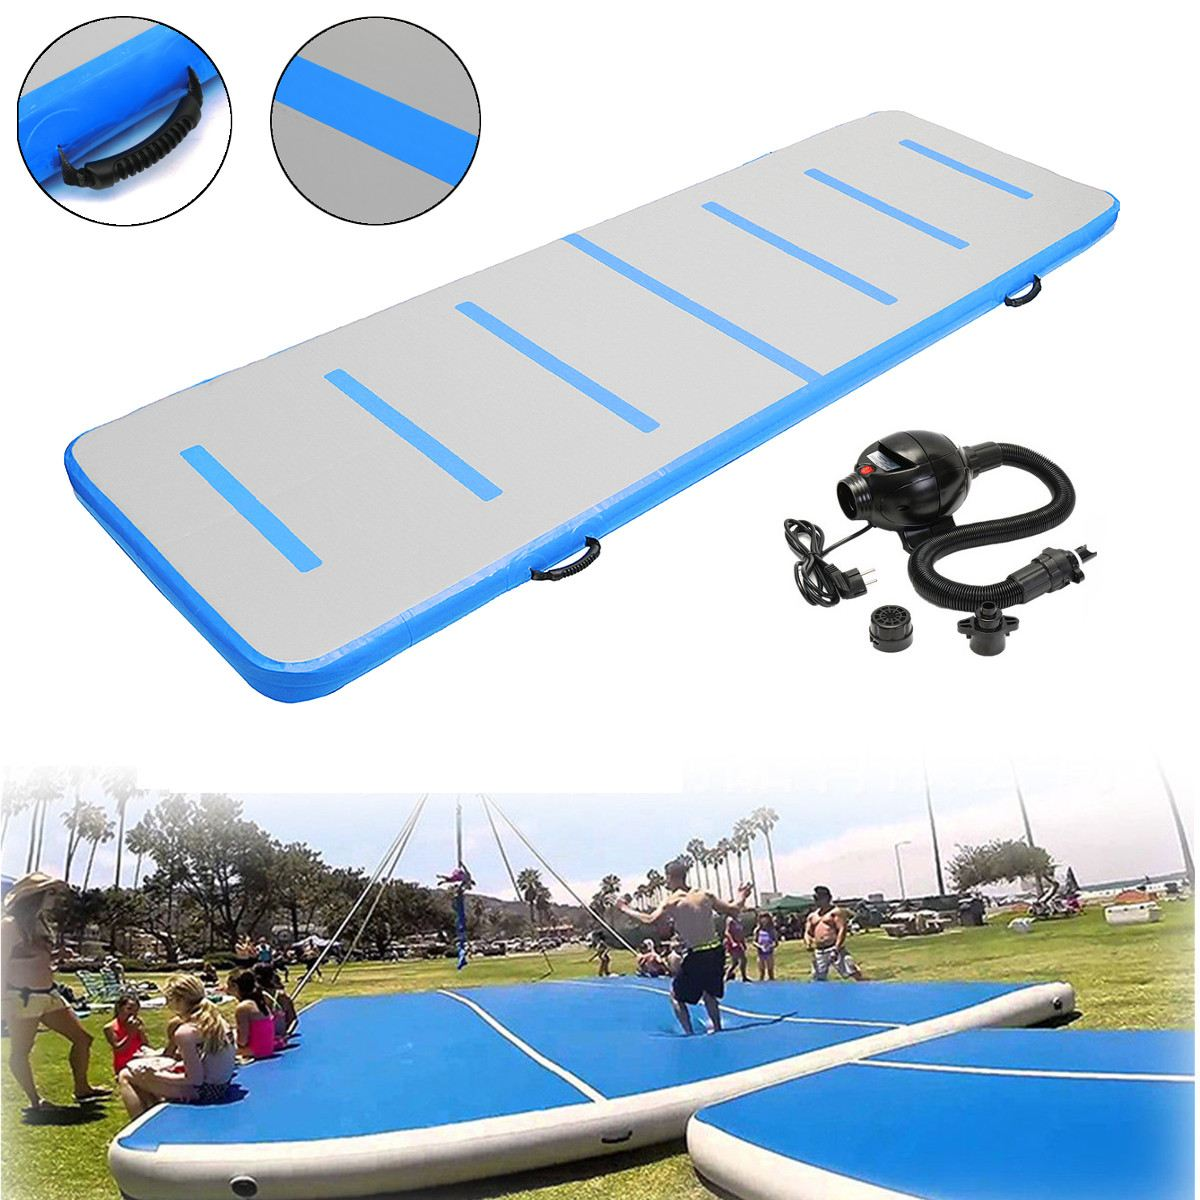 300x90x10cm Inflatable Air Track Tumbling Floor Gymnastics Training Pad GYM Mat Taekwondo Air Cushion with pump free shipping 6 2m inflatable gym air track inflatable air track gymnastics